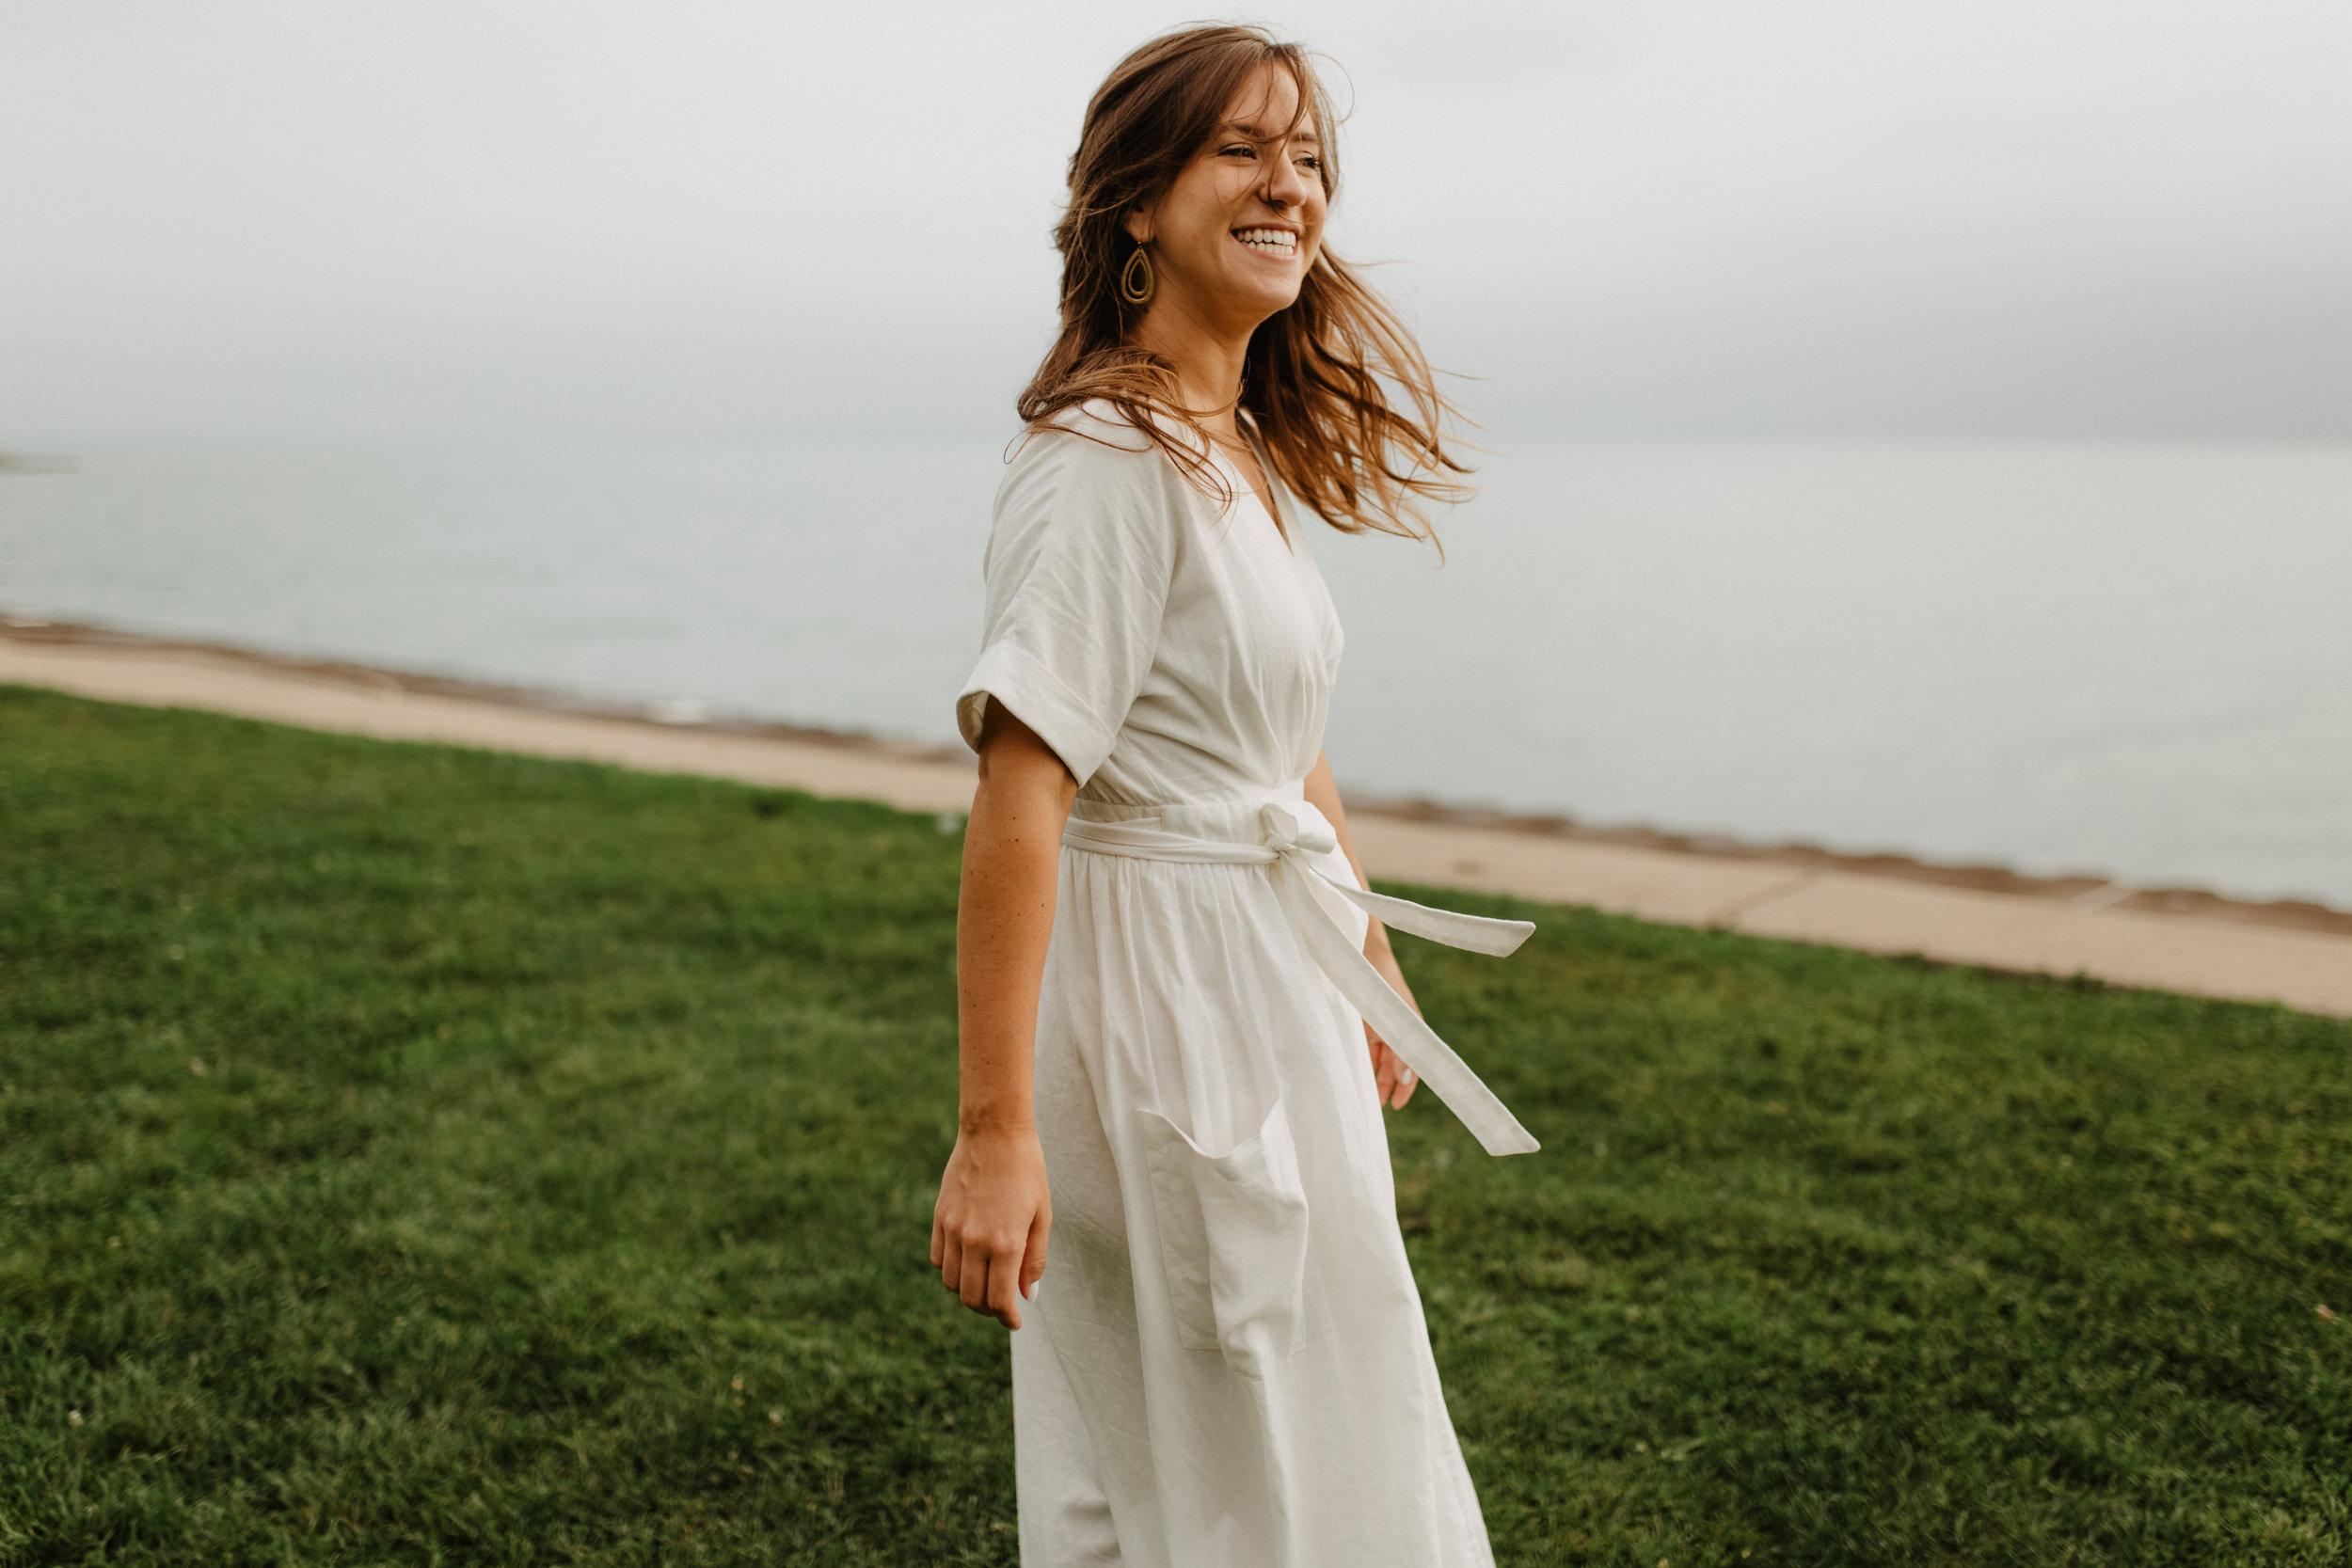 Taryn-Zak-Lake-Michigan-Engagement-9